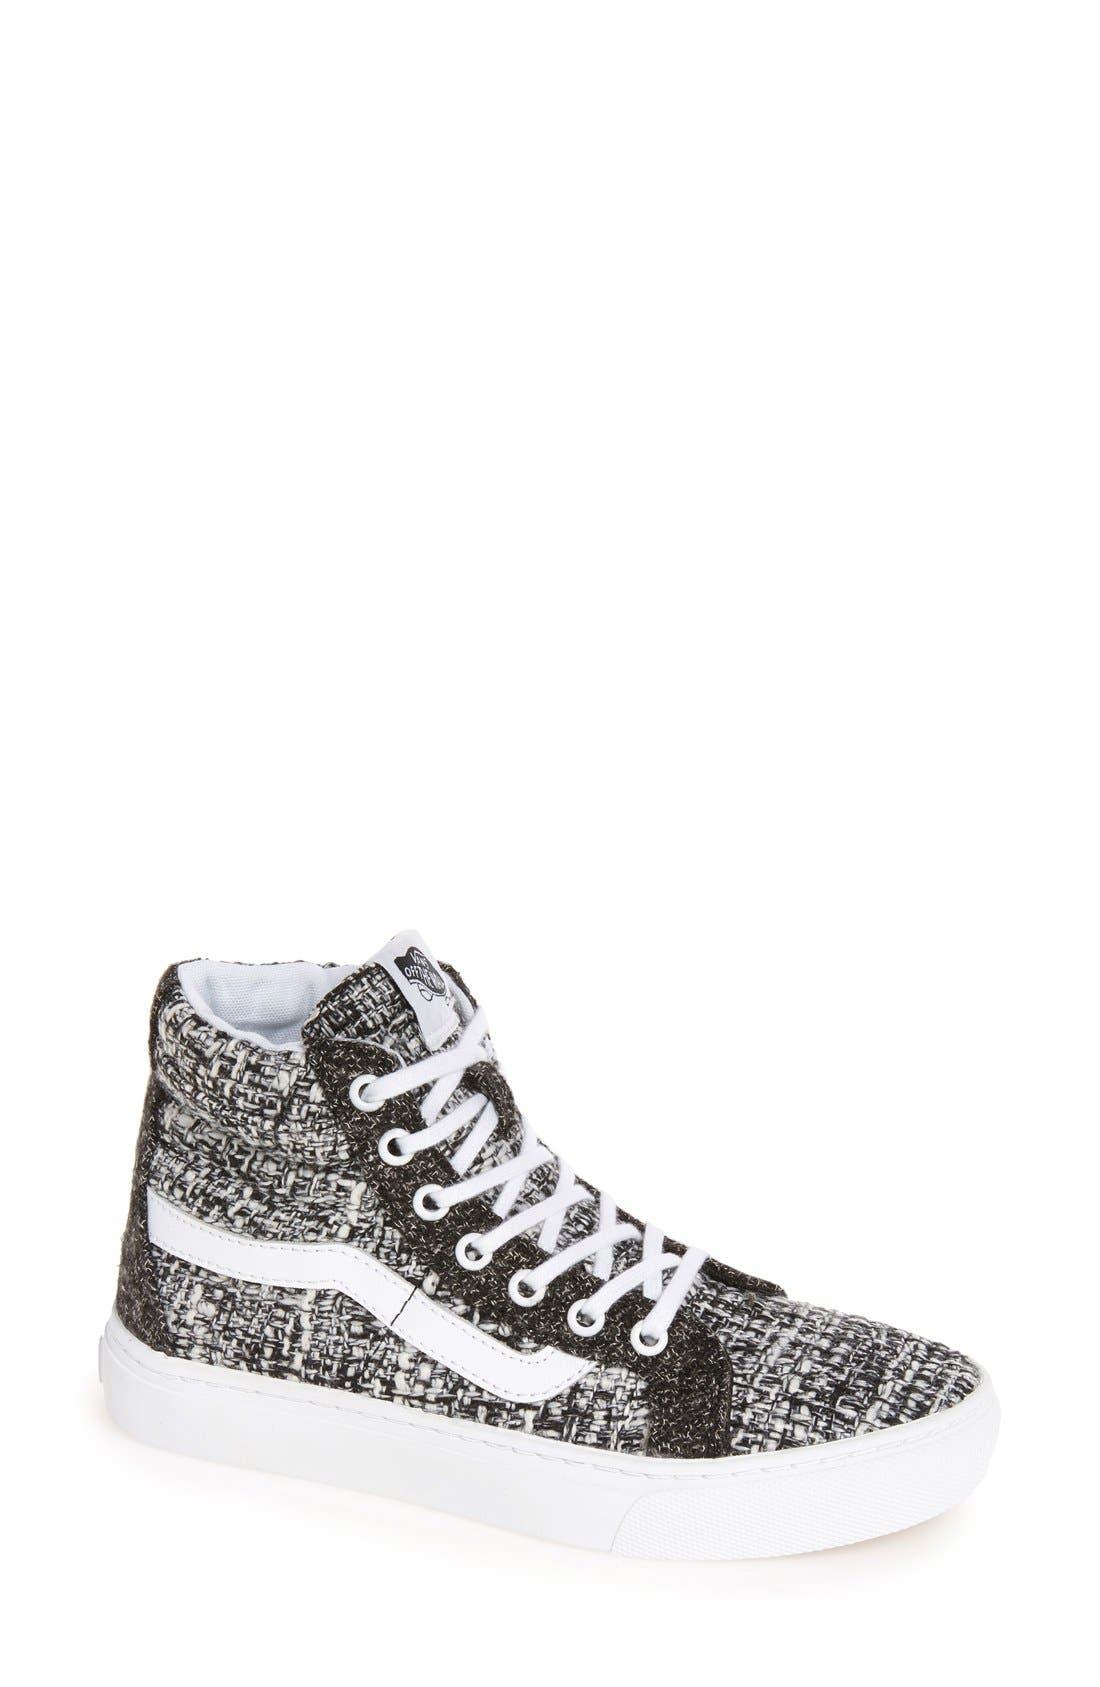 Alternate Image 1 Selected - Vans Sk8-Hi High Top Sneaker (Women)